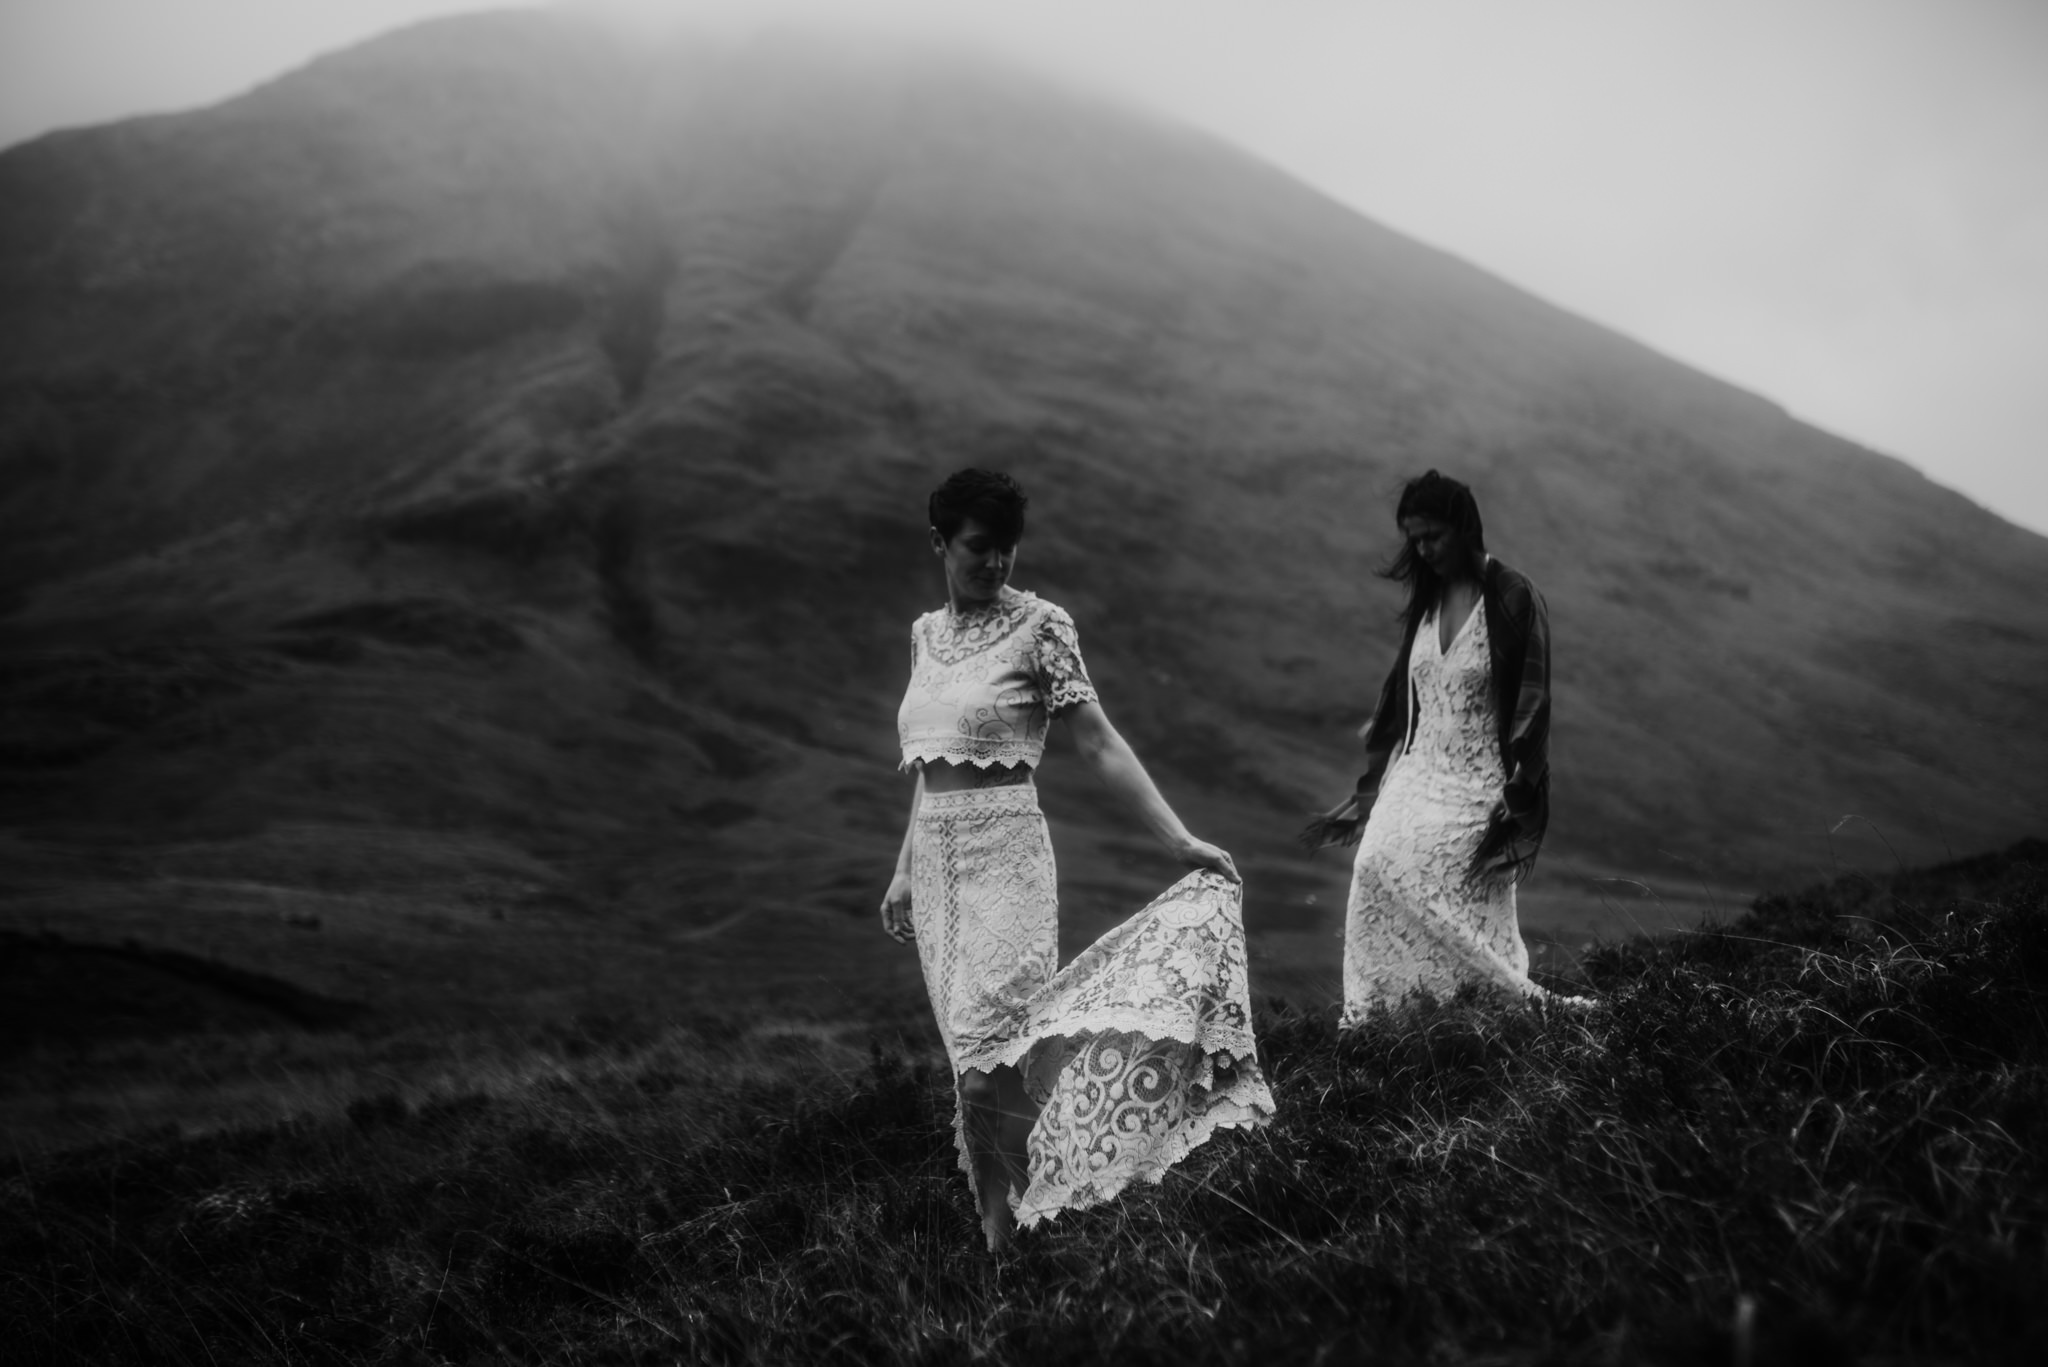 twyla jones photography - scotland glencoe moody same sex elopement brides -27.jpg